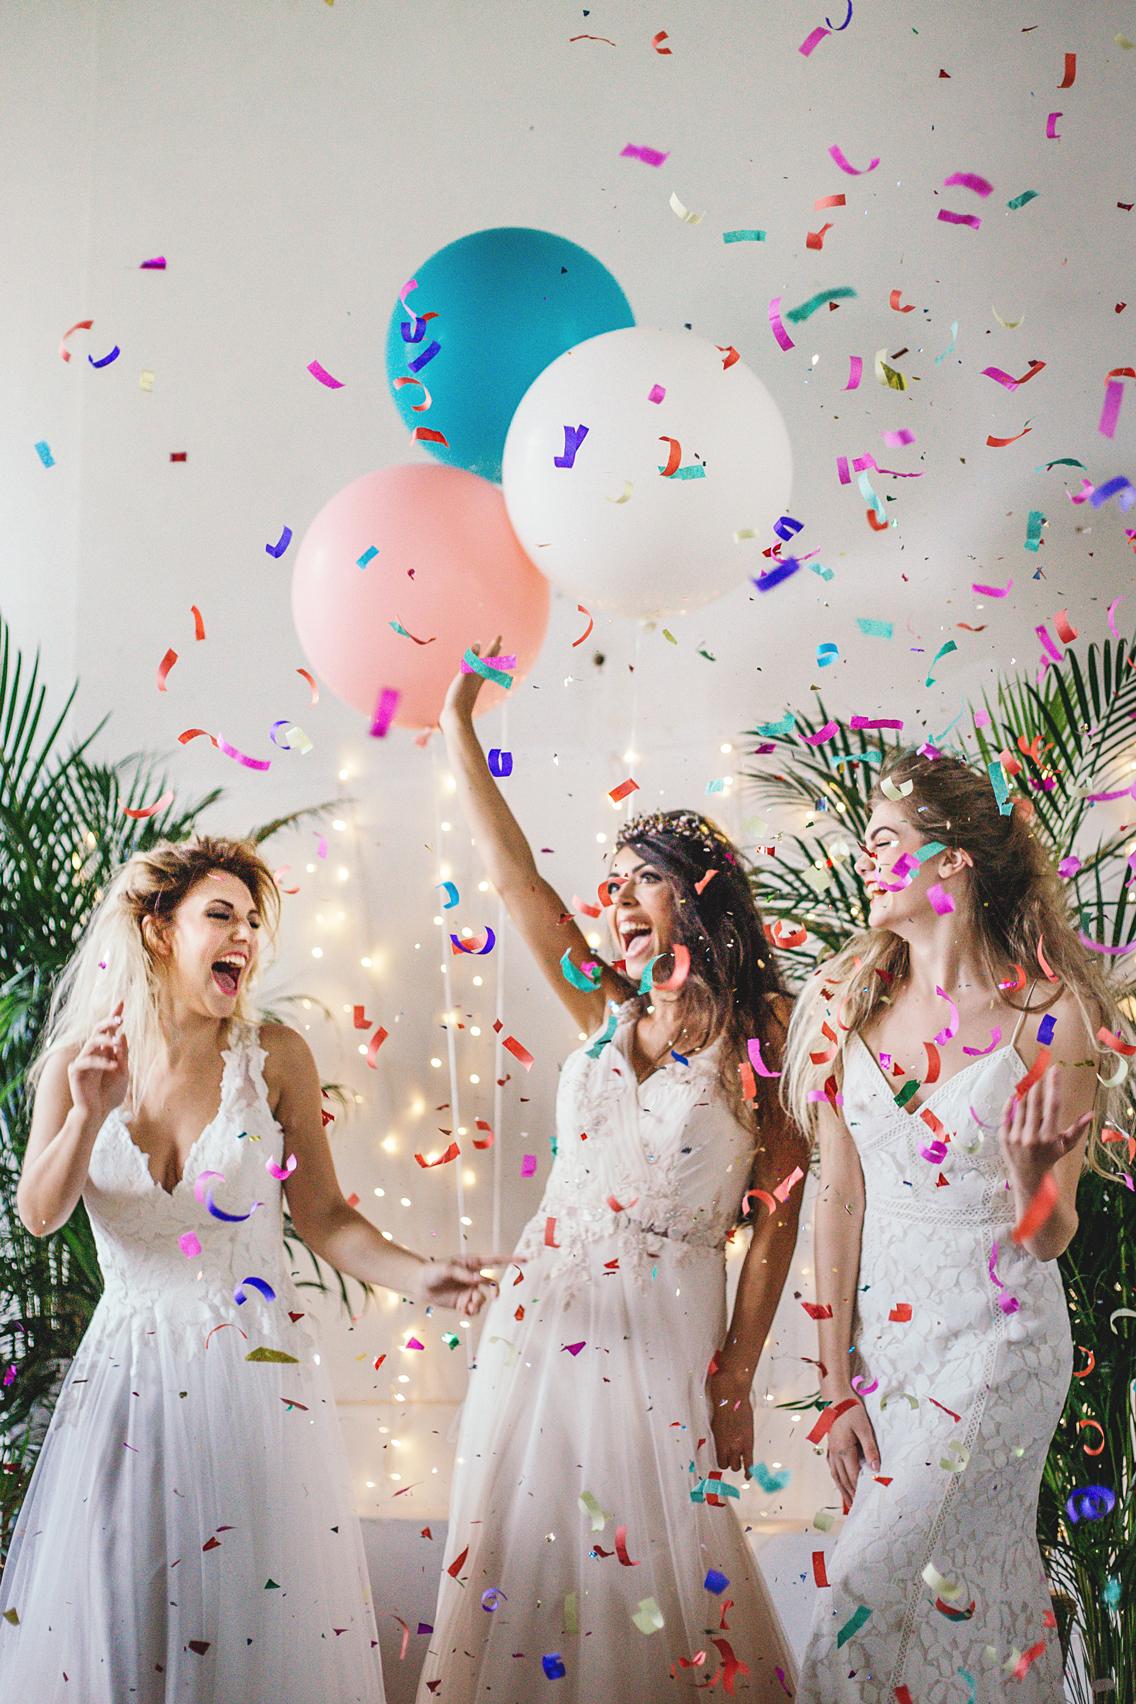 norfolk_wedding_photographer _norwich_anglia_documentary_reportage_storybook (28).jpg